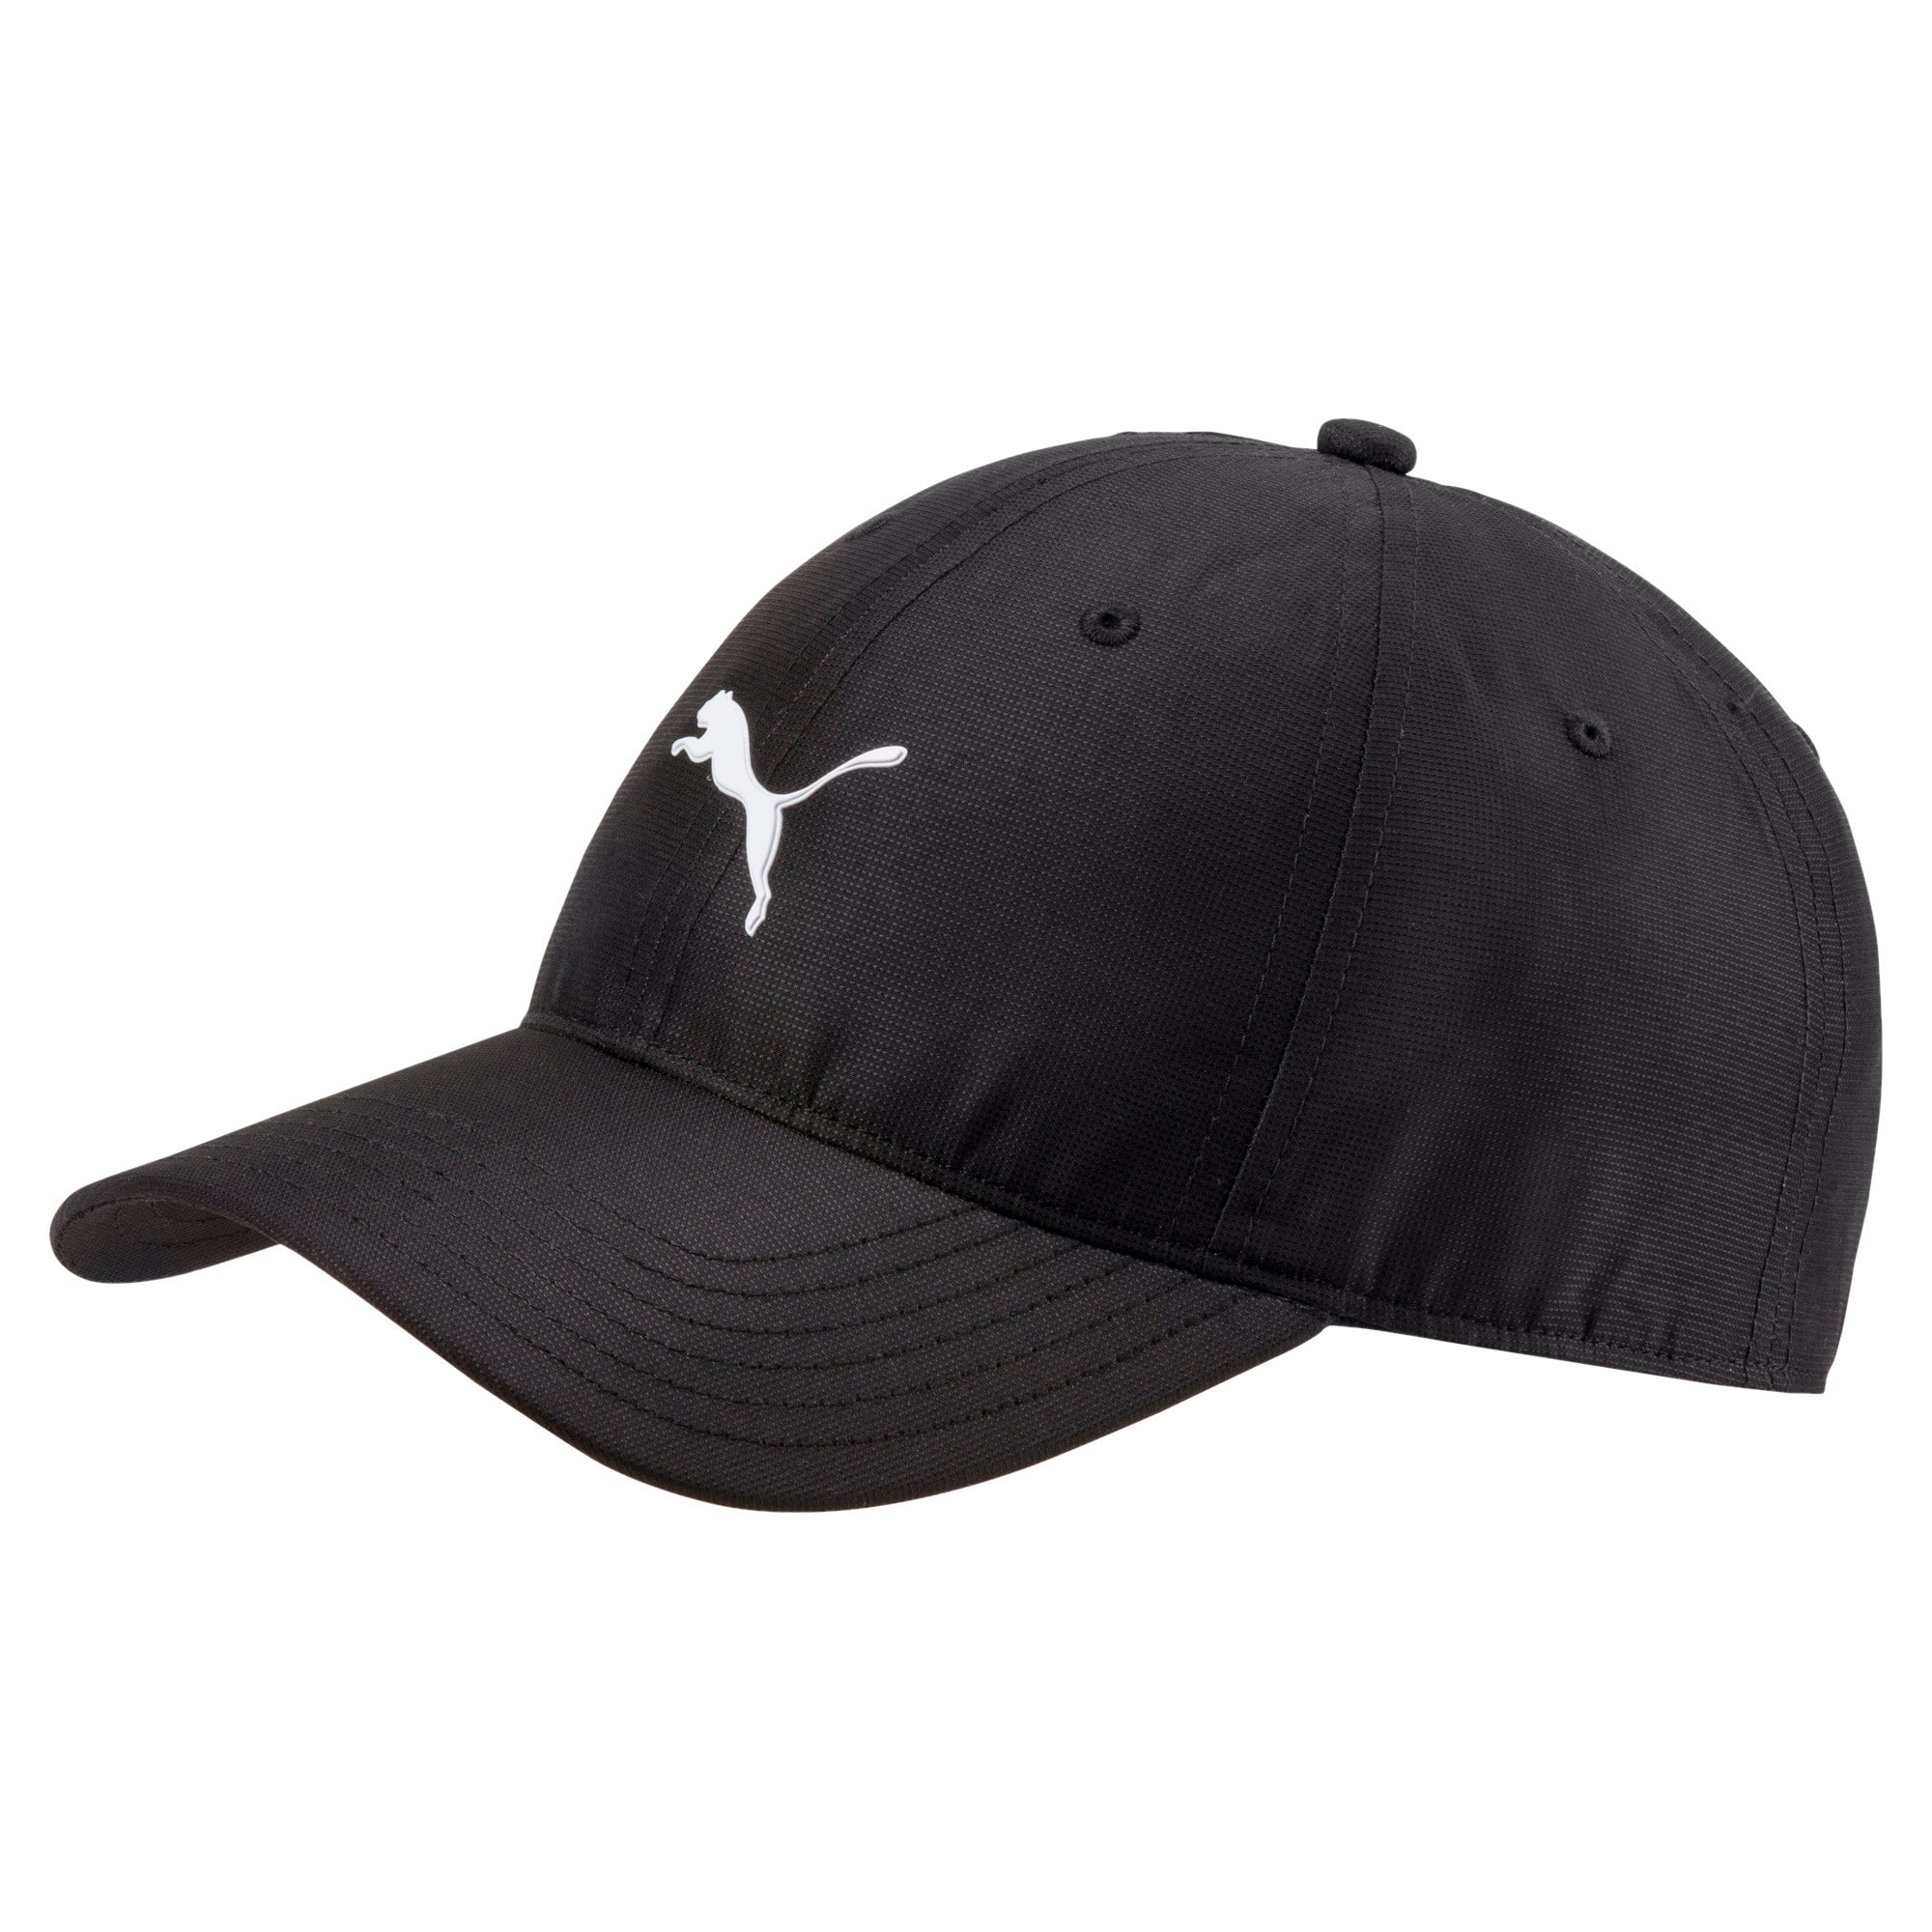 Thumbnail 1 of Golf Men's Pounce Adjustable Cap, Puma Black, medium